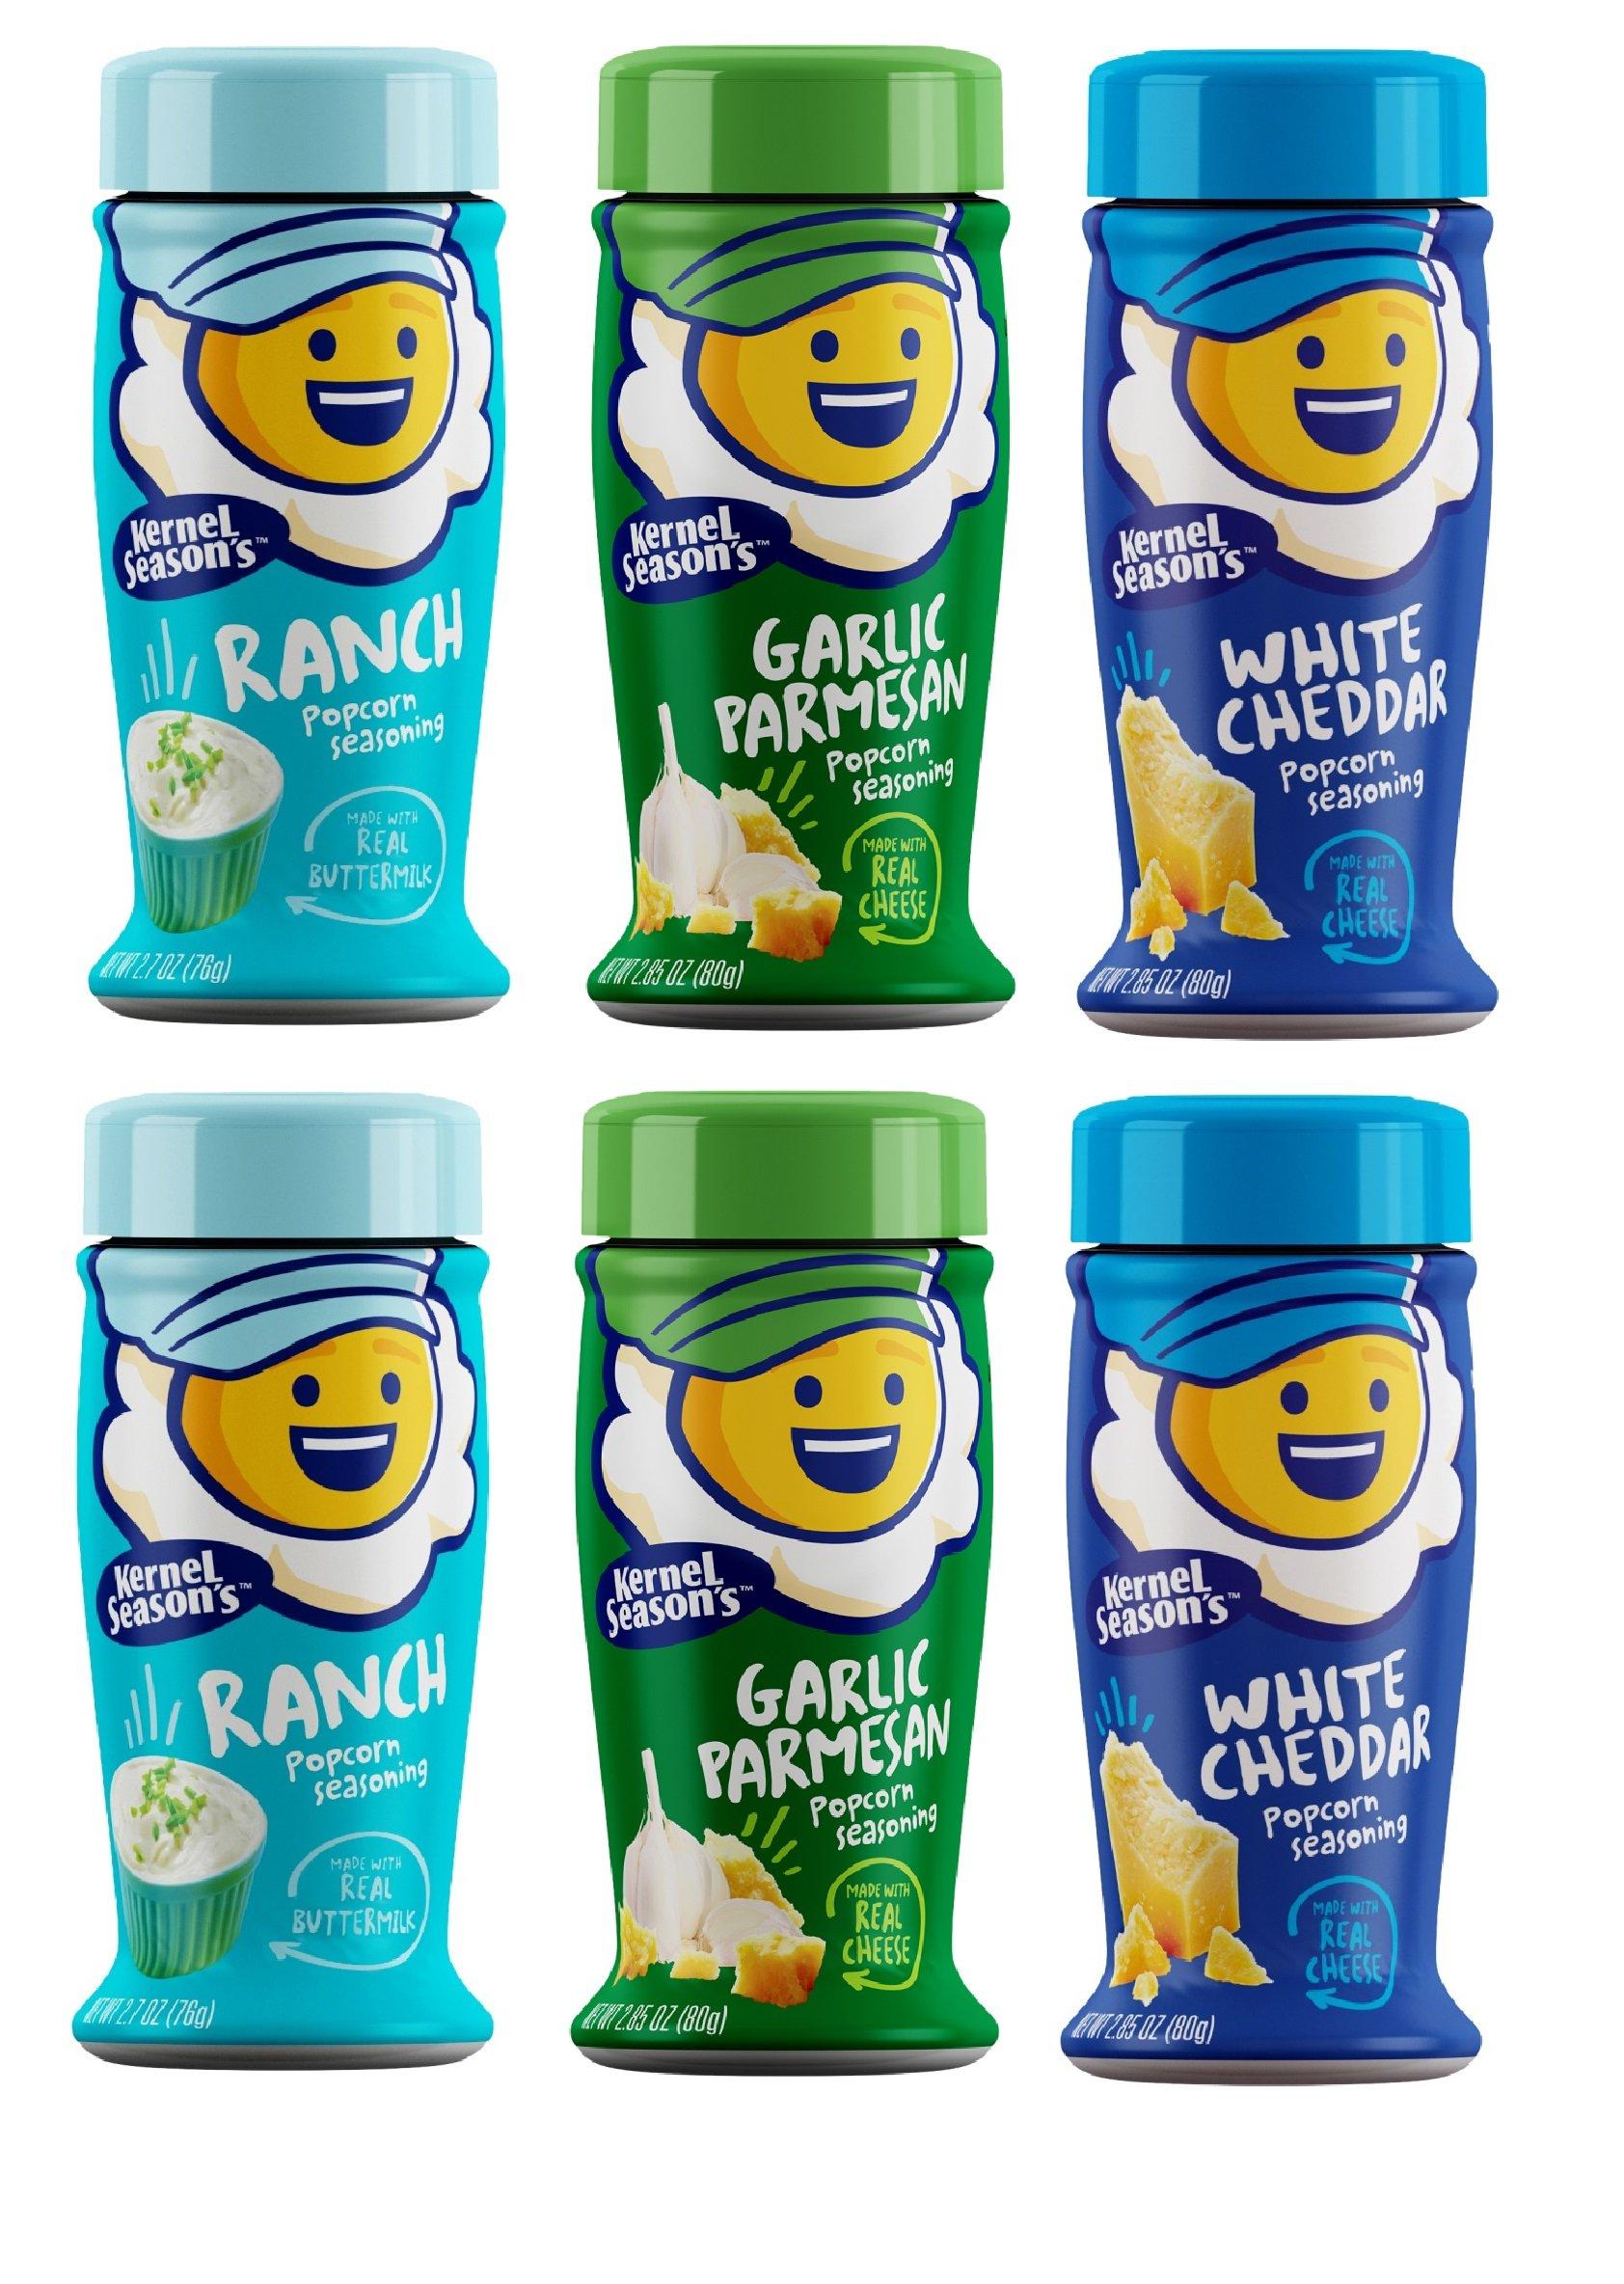 Kernel Season's Popcorn Seasoning Variety Pack of 6 Ranch Parmesan & Garlic and White Cheddar by Kernel Season's (Image #1)